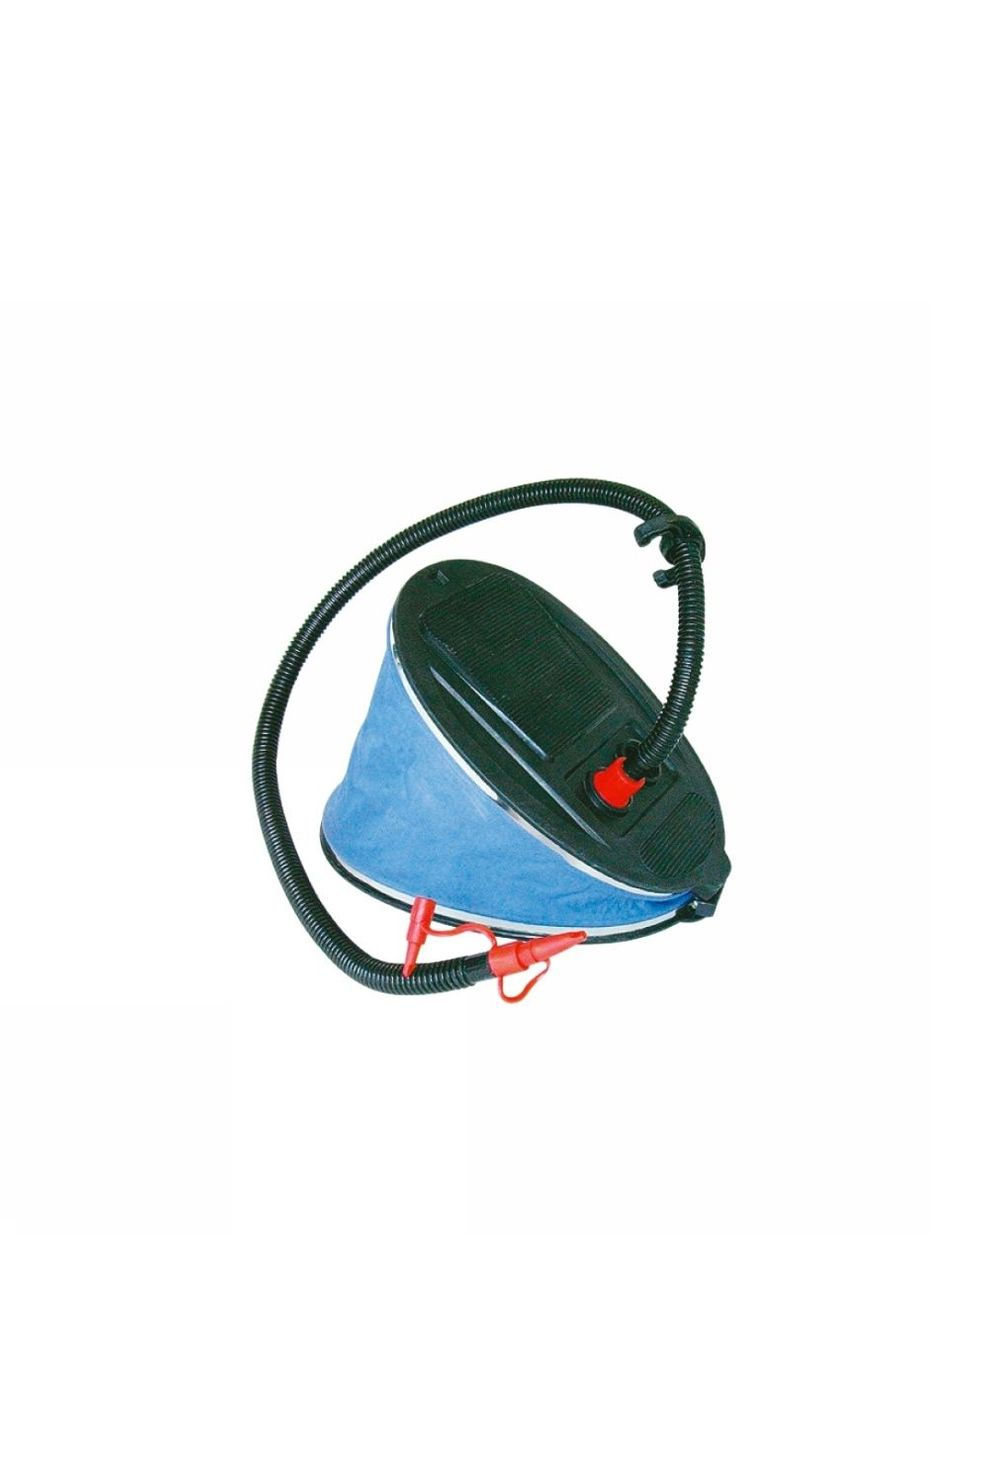 Transfilco Pomp 3L - Geel/Zwart